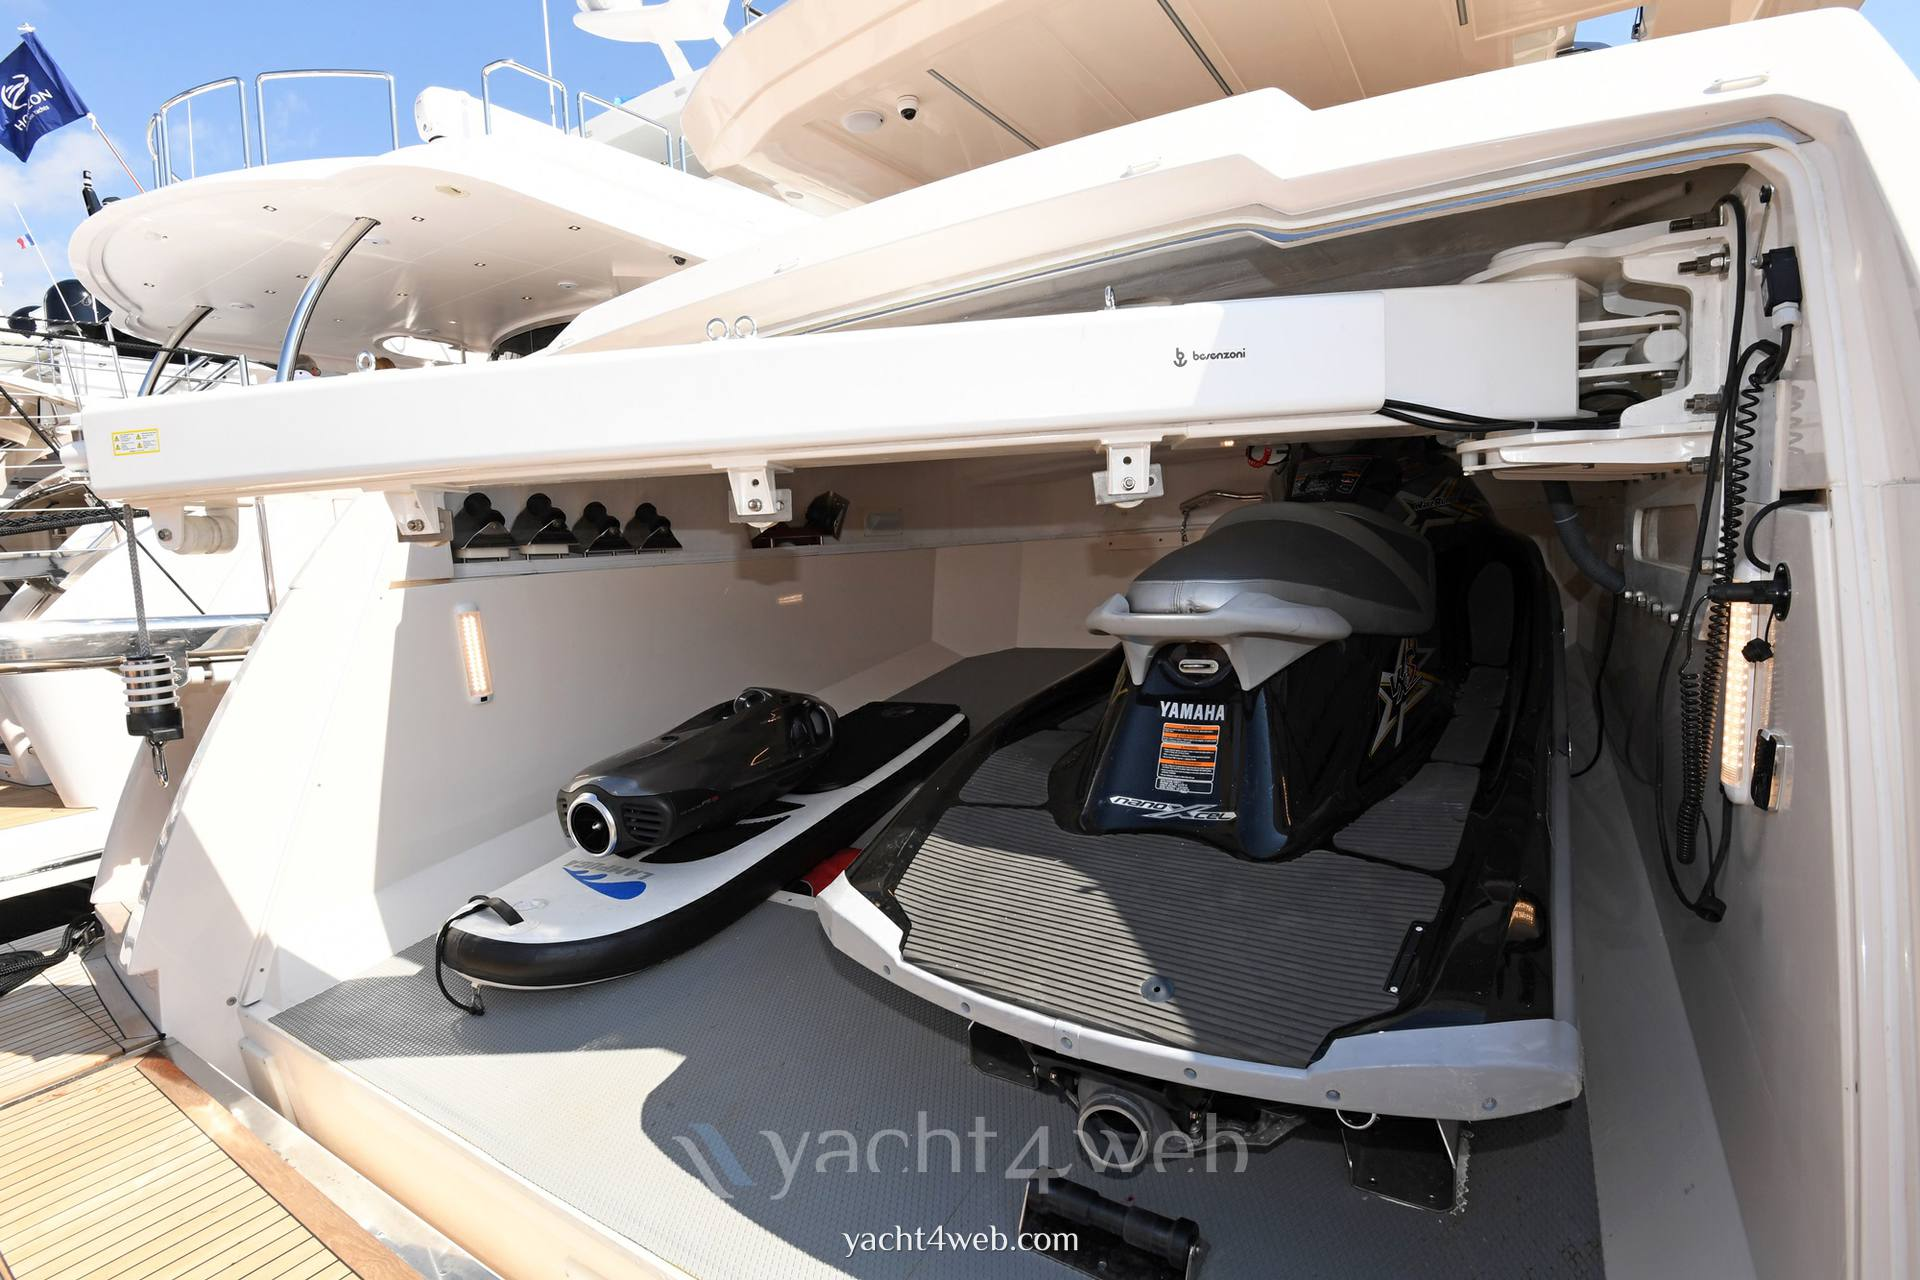 Cayman Yachts F920 2018